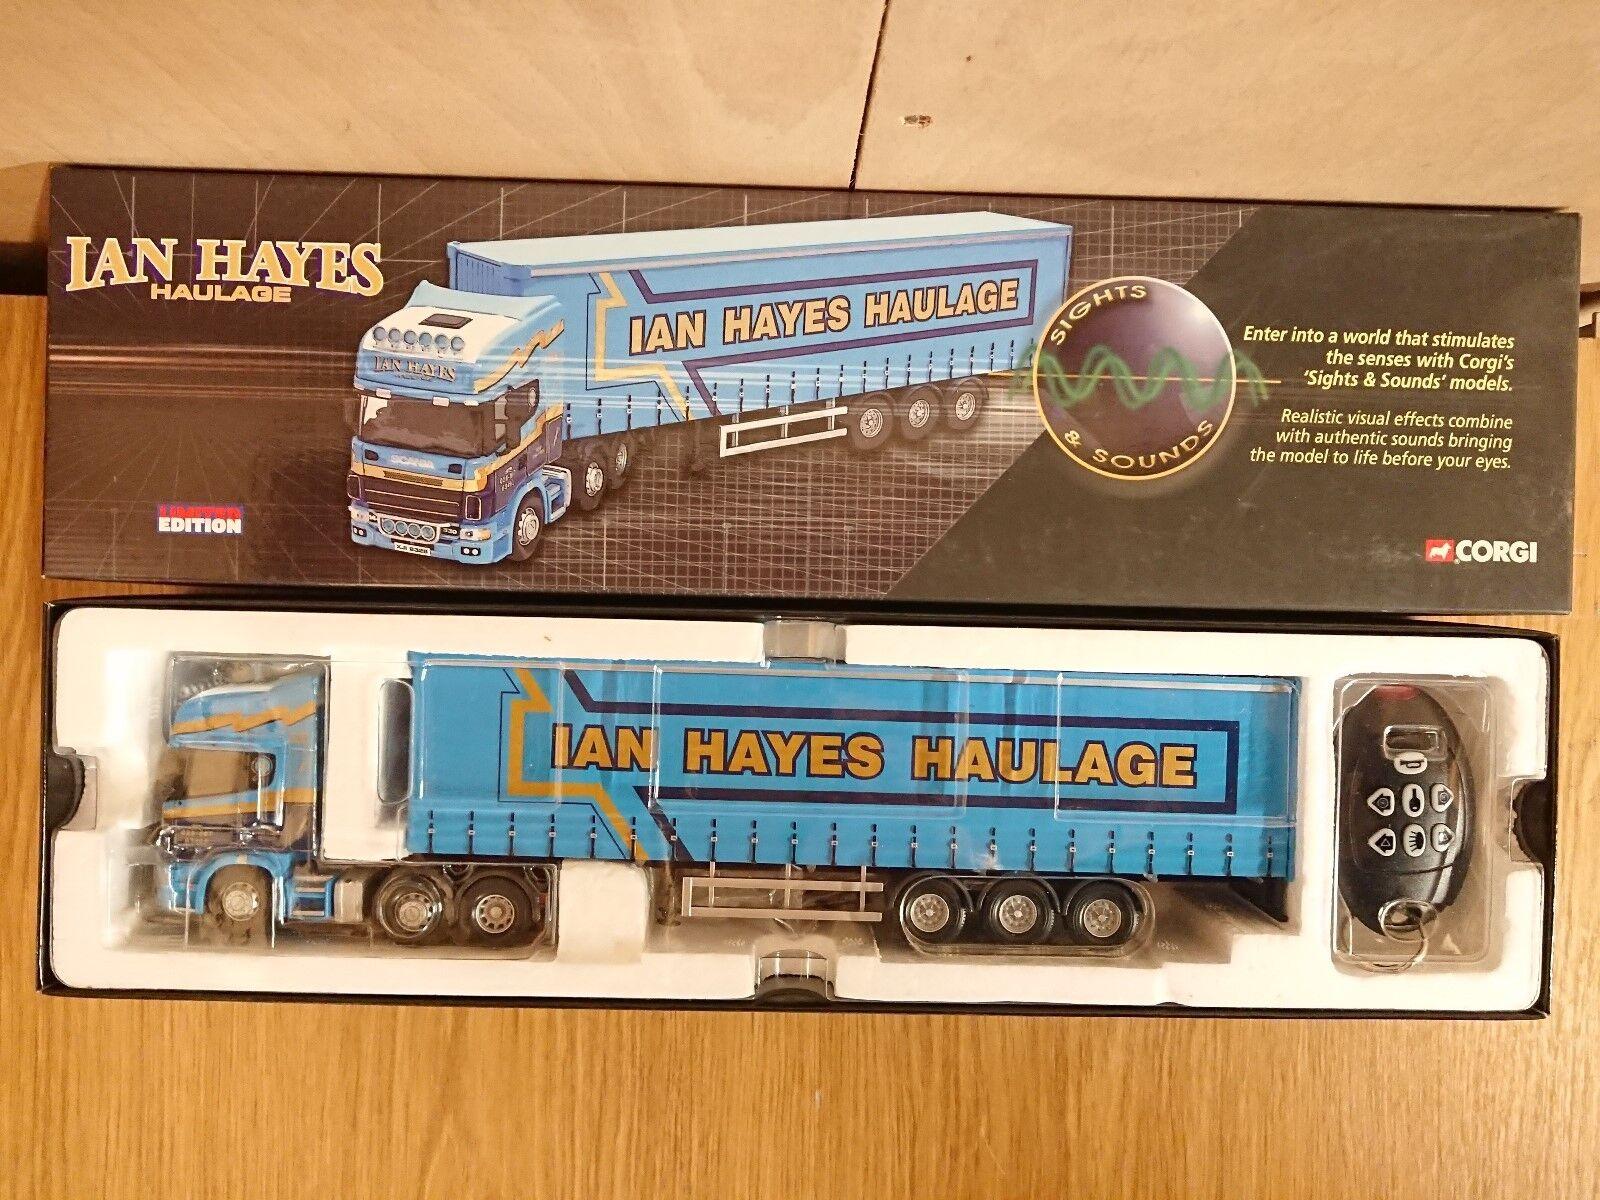 preferente Corgi Corgi Corgi CC12935 vista y sonido Scania Topline Ian Hayes Ltd Edition no 0001 de 3310  diseño único